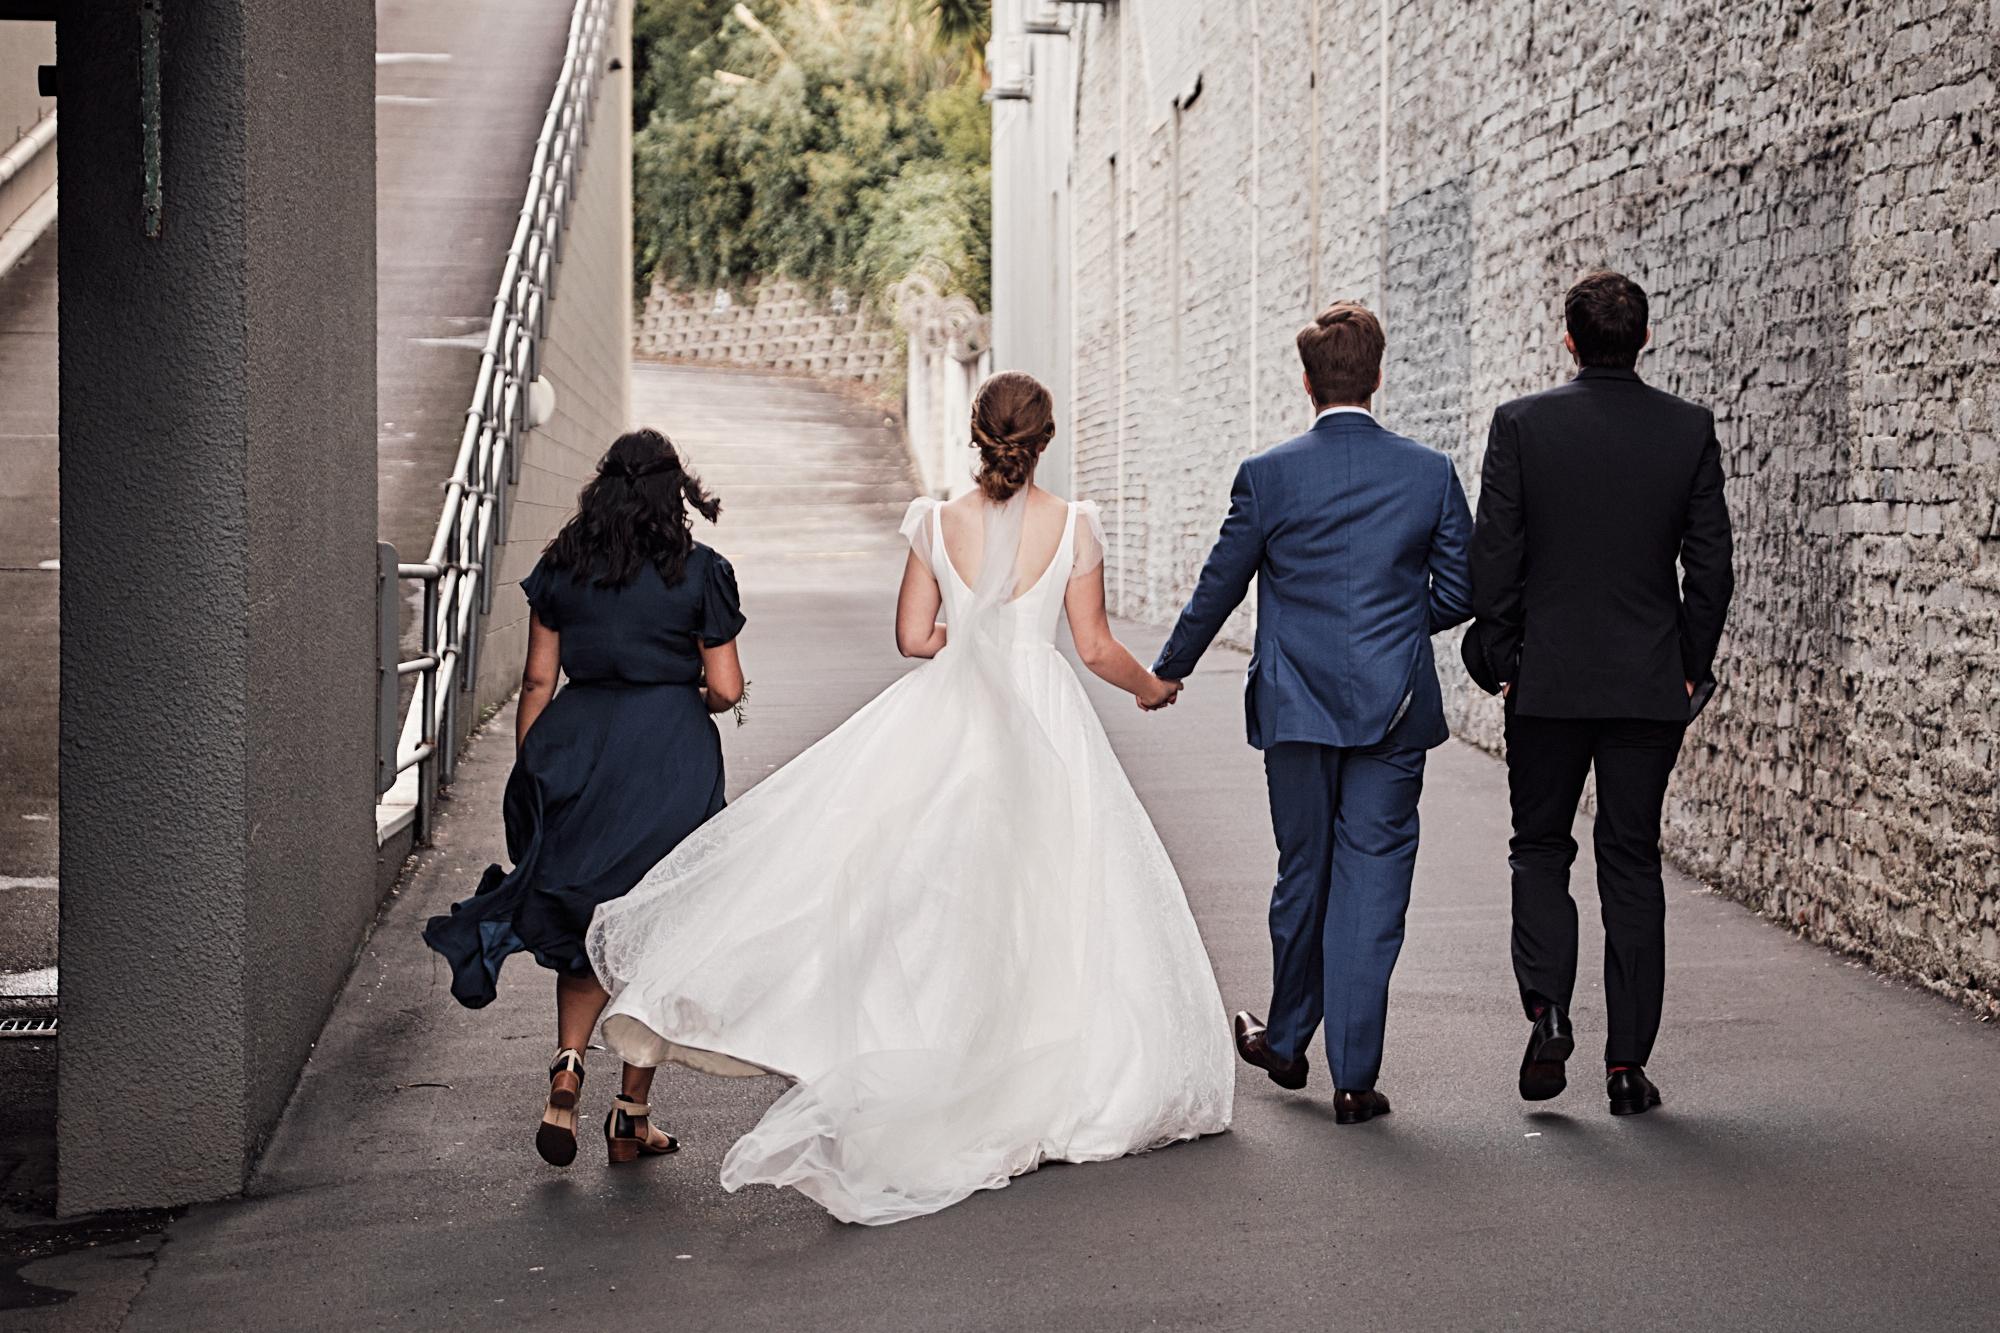 wedding photographers Auckland 87567